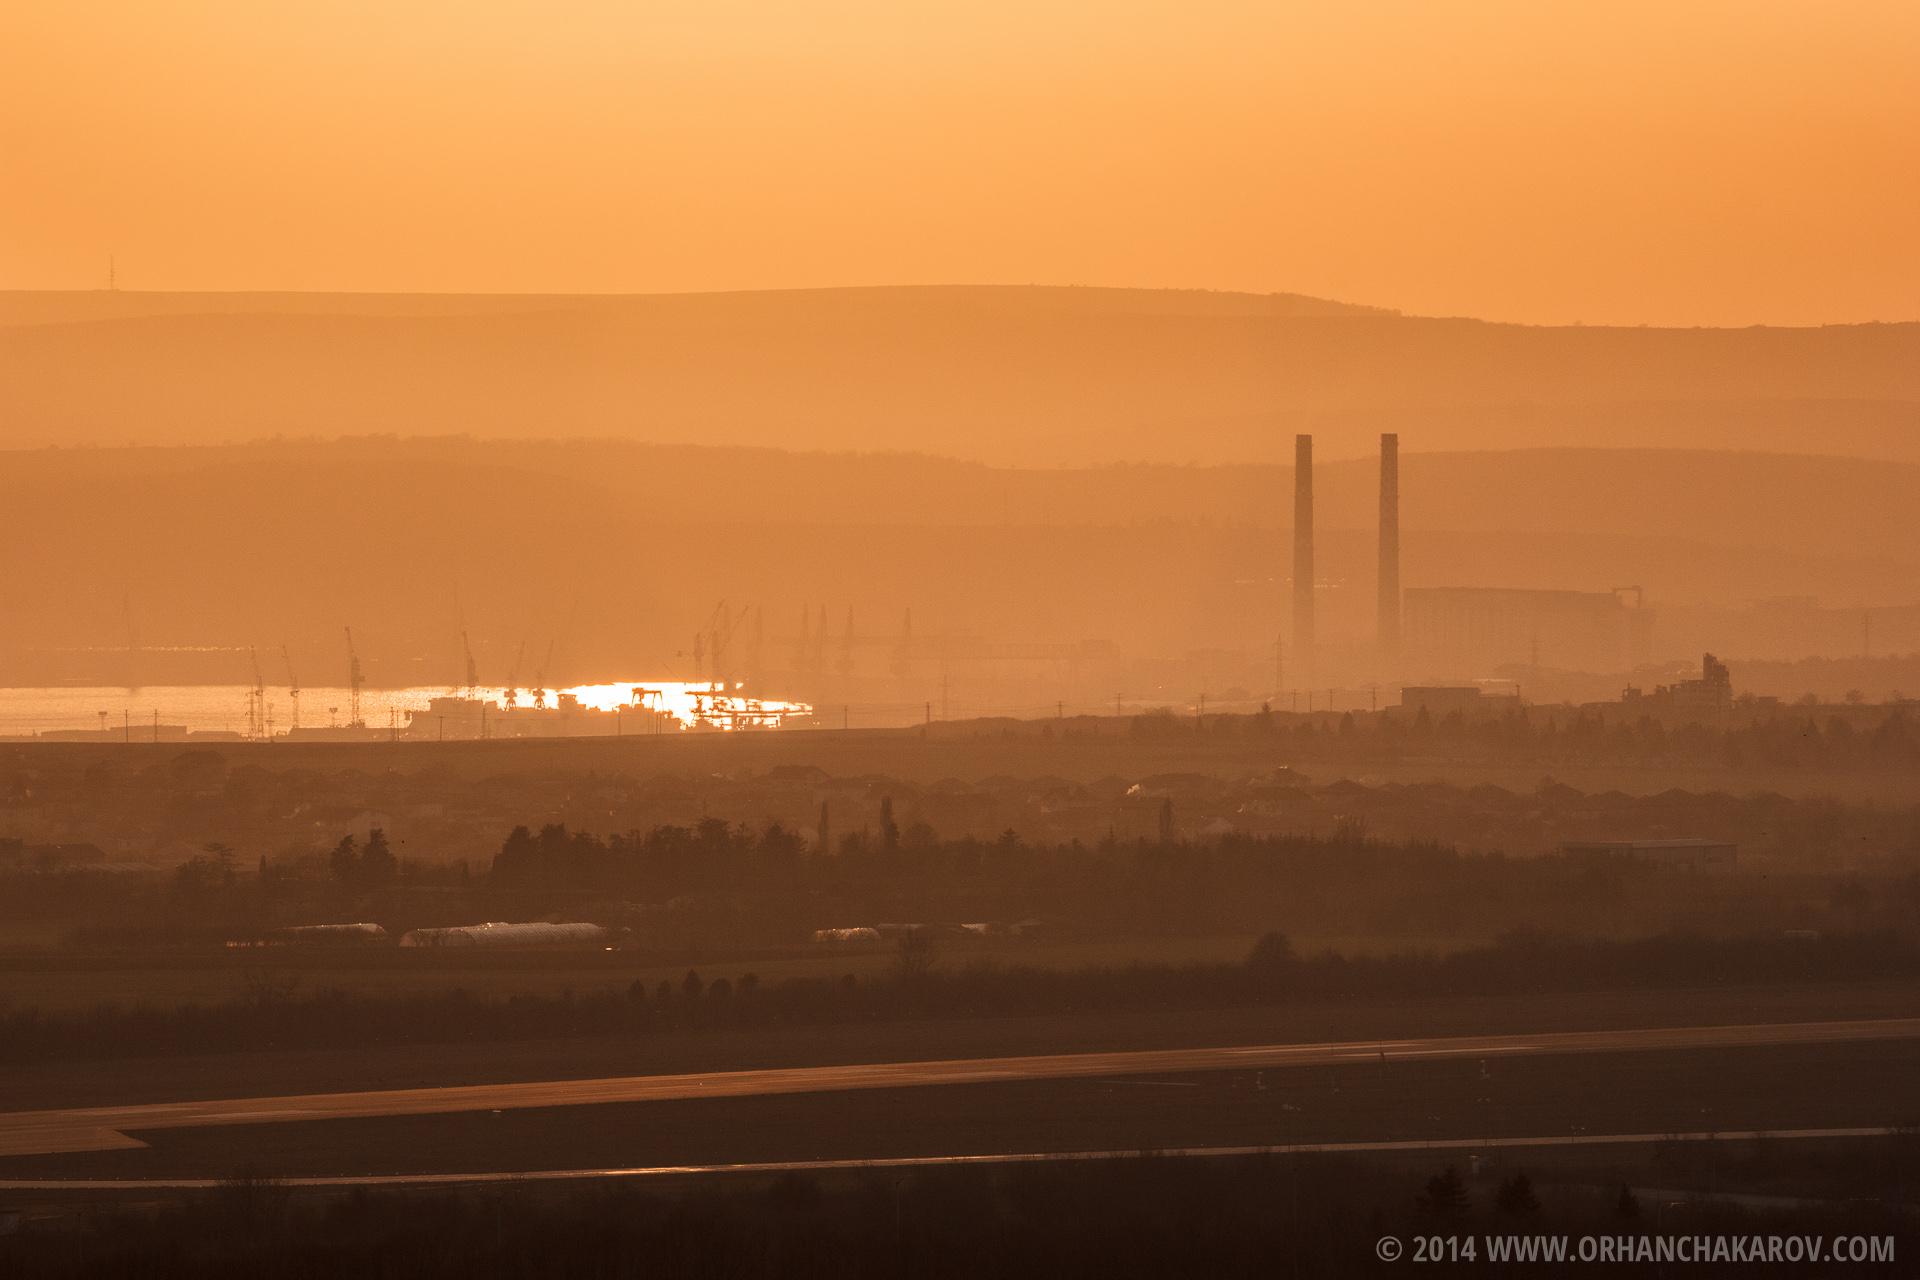 Залез над ТЕЦ Варна. Фотограф - Орхан Чакъров, град Варна